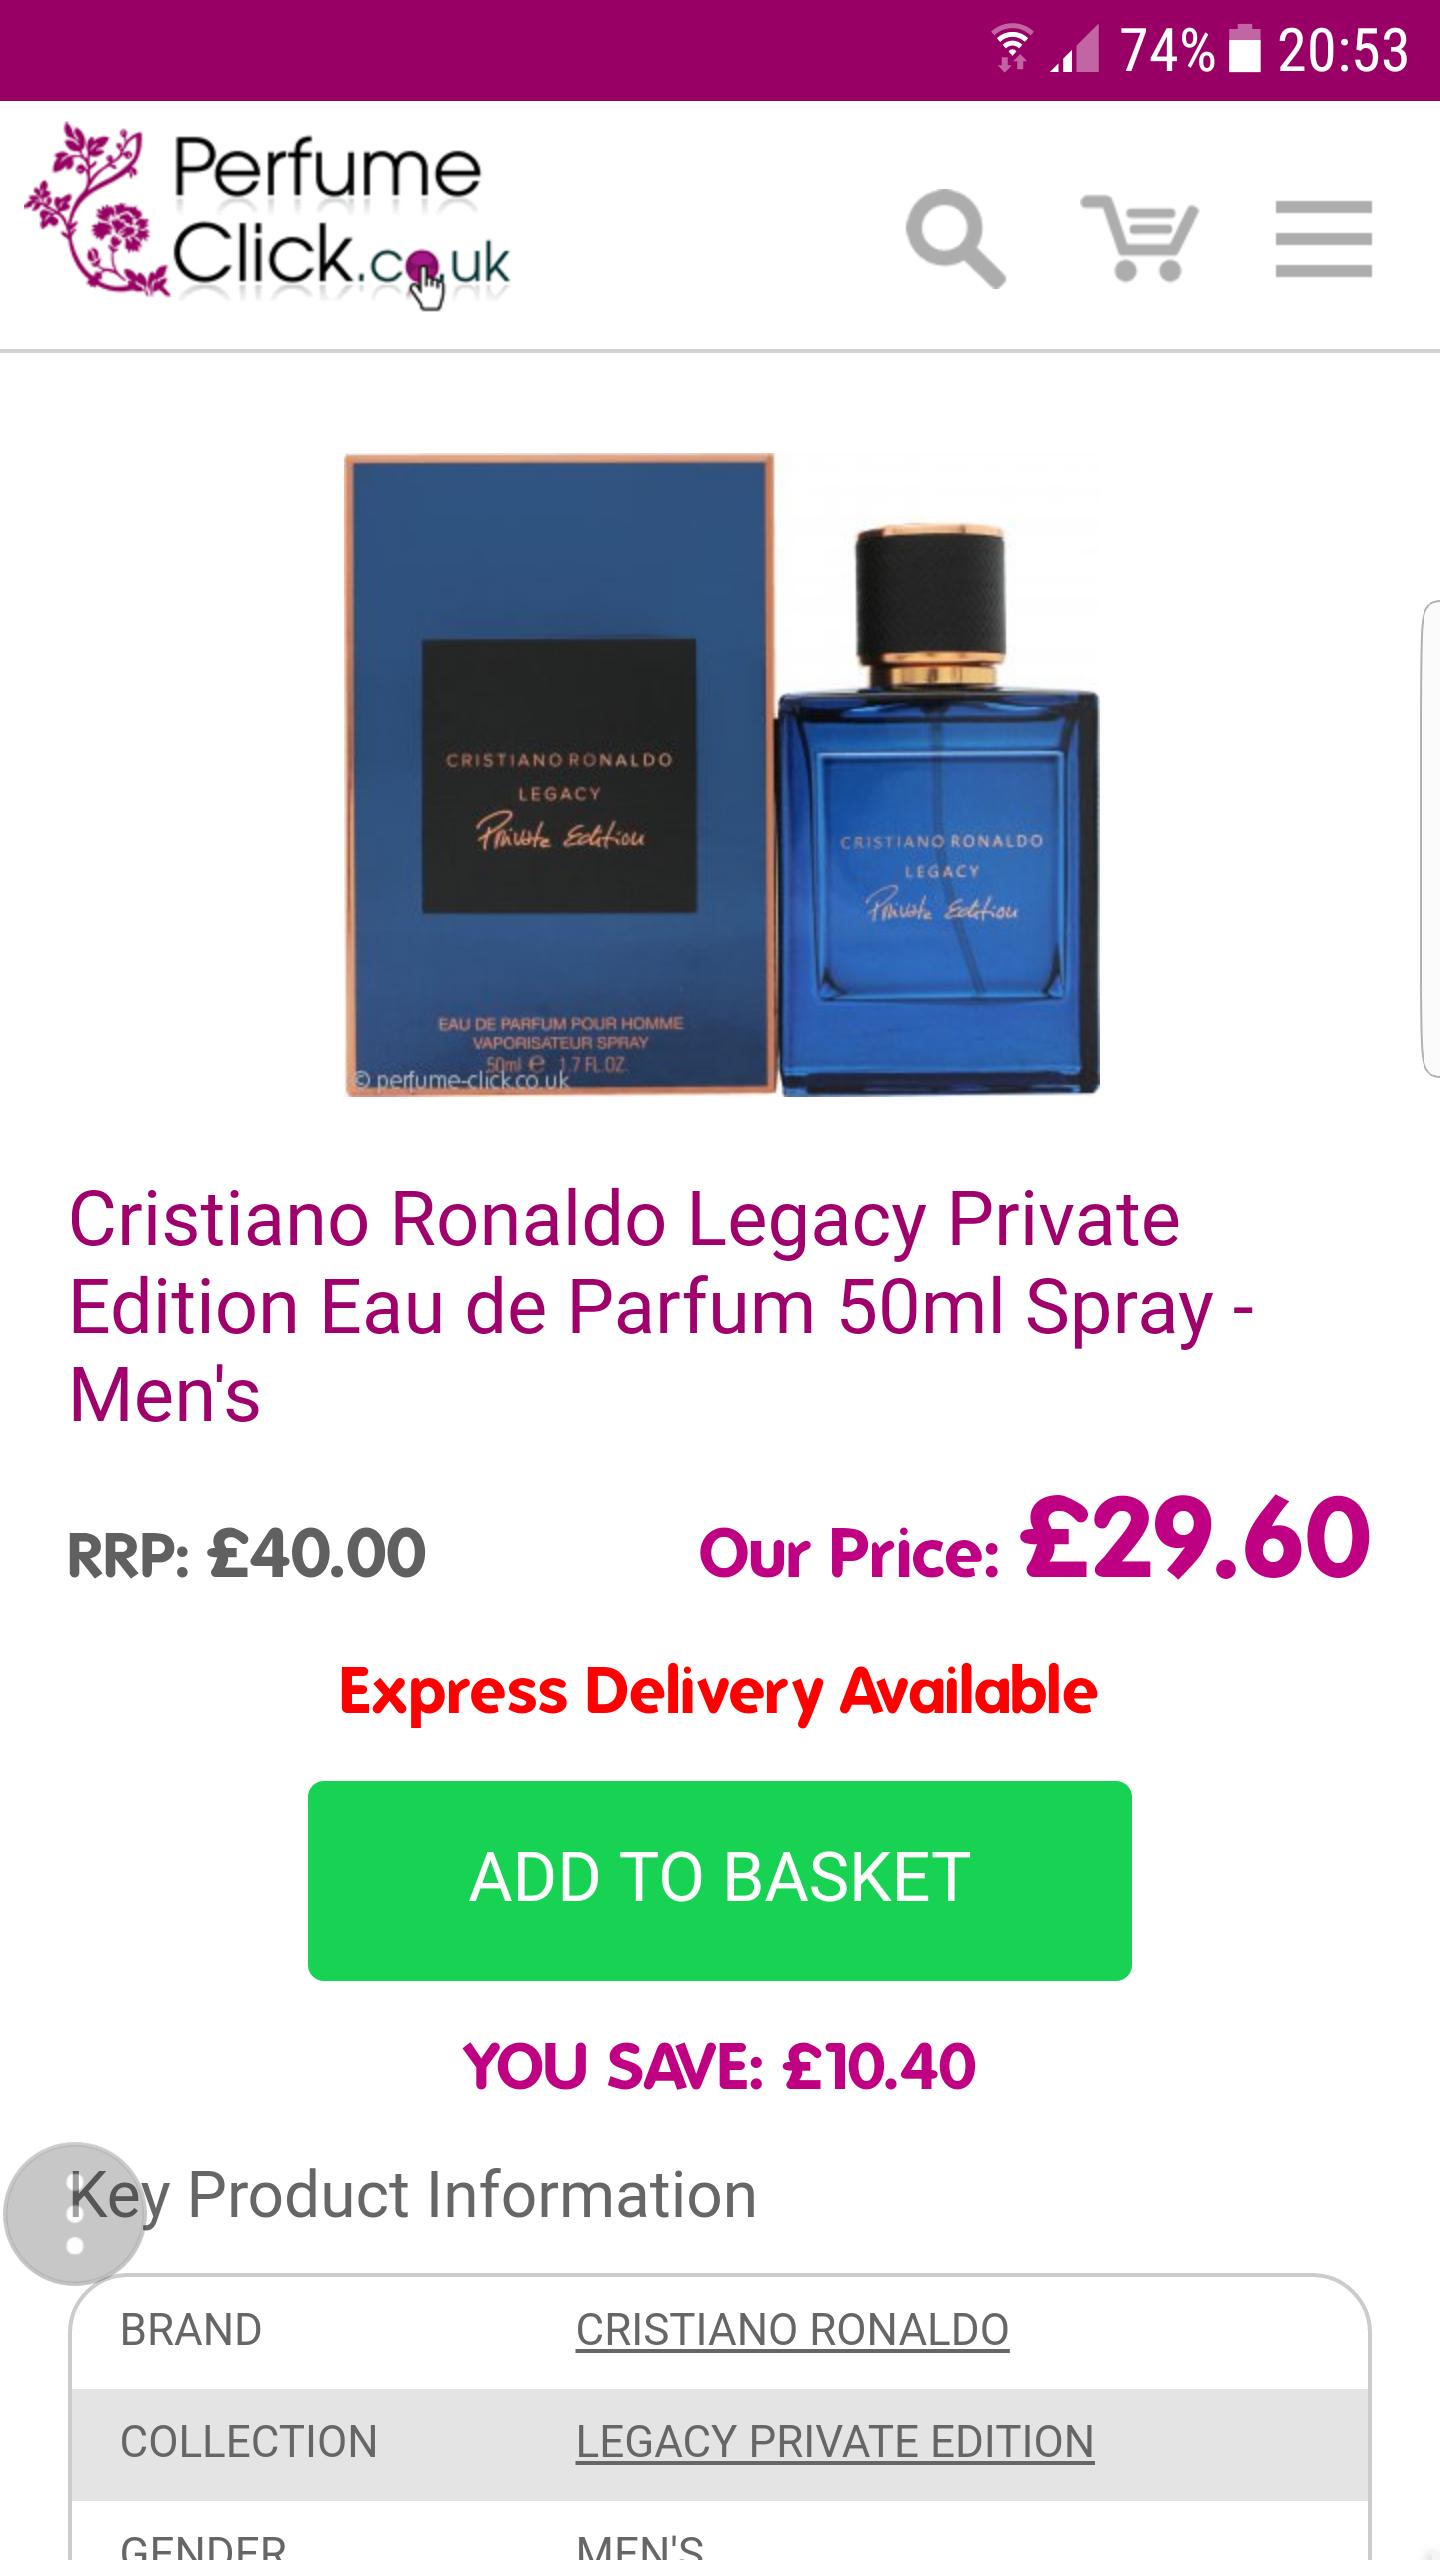 Cristiano Ronaldo Legacy Private Edition Eau de Parfum 50ml Spray - Men's - £29.60 @ Perfume Click